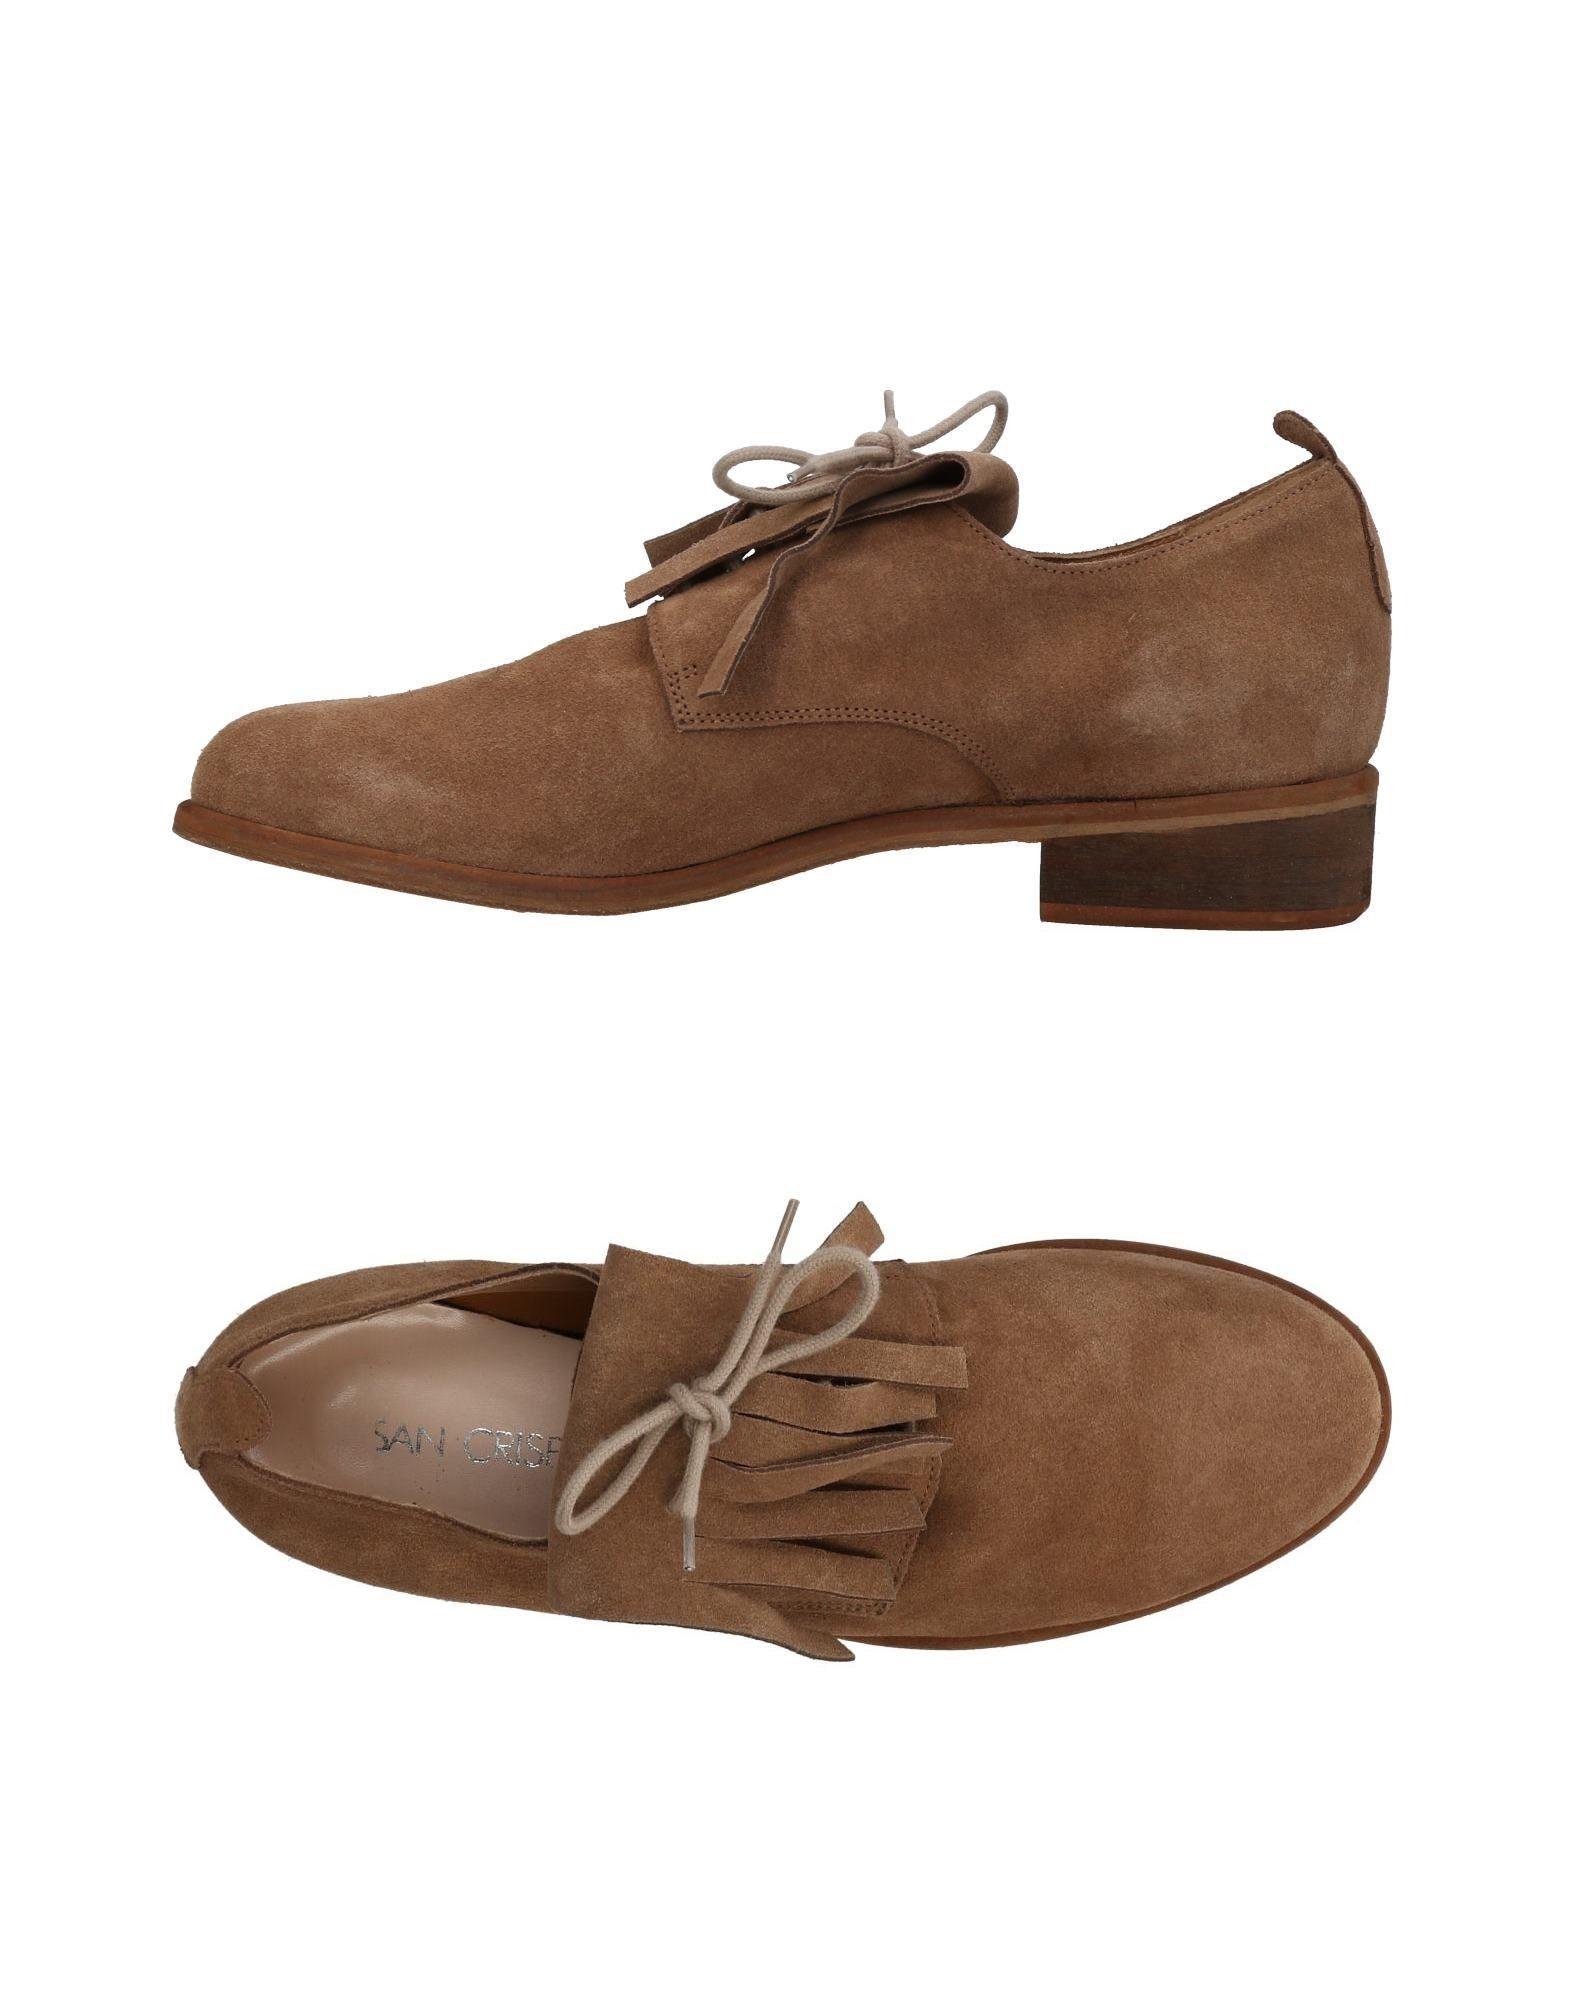 Chaussures À Lacets San Crispino Femme - Chaussures À Lacets San Crispino sur